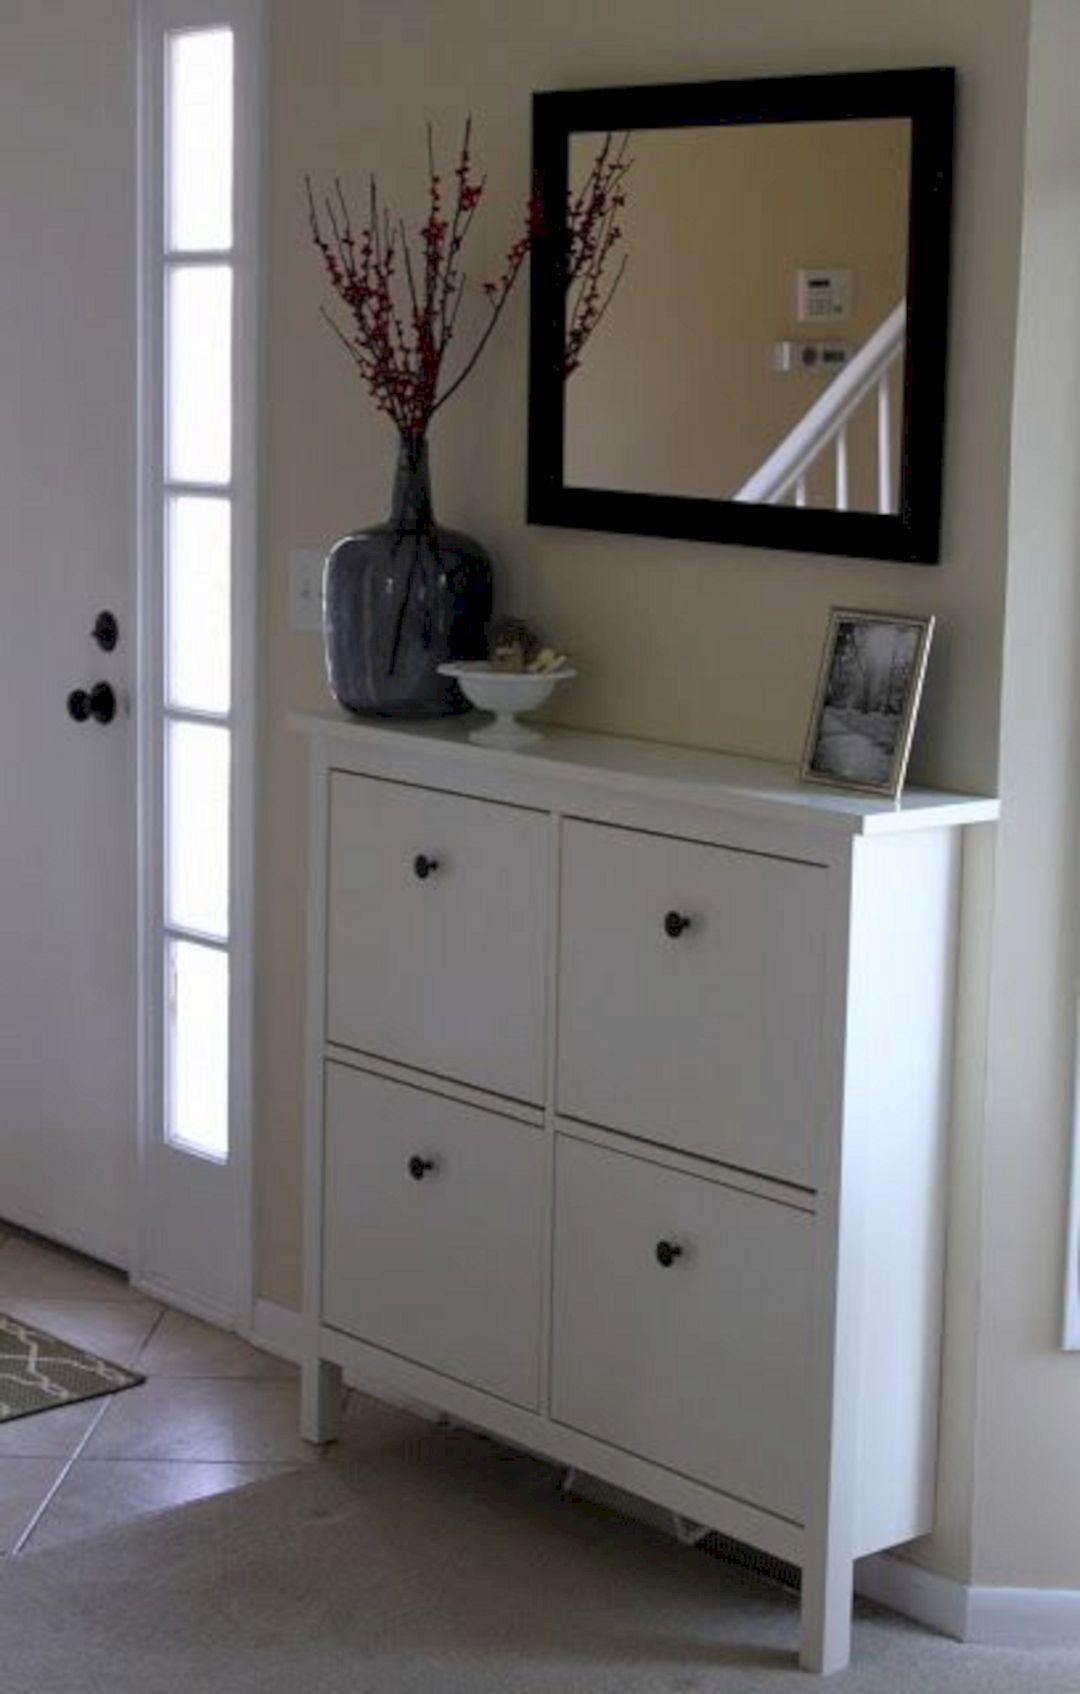 Astounding 35 Wonderful Small Entryway Cabinet Design Ideas Https Freshouz Com 35 Wonderful Small Entryway Cabinet Design Ideas Home Home Interior Decor